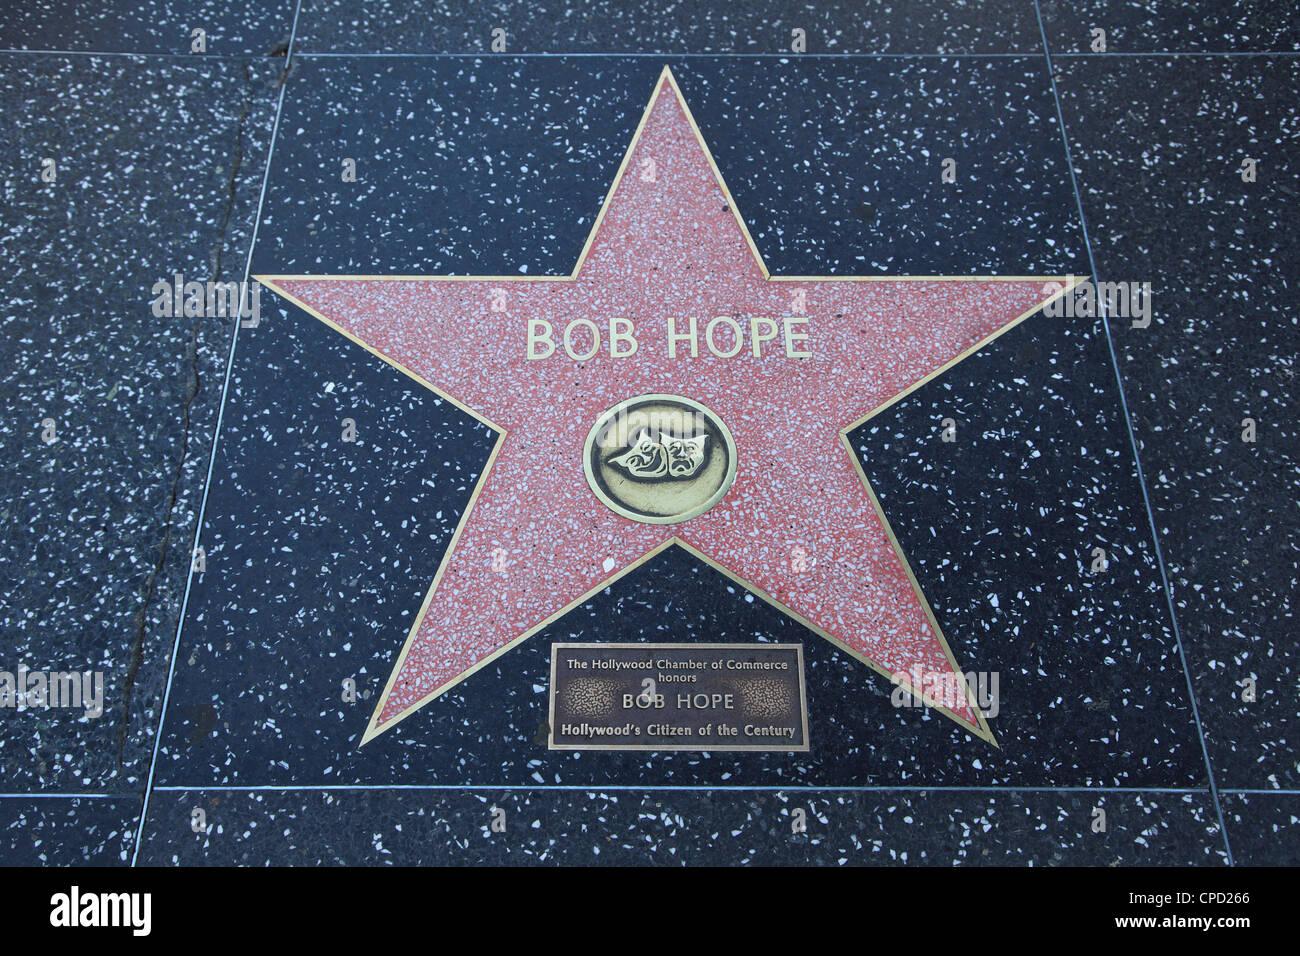 Bob Hope, Star, Hollywood Walk of Fame, Hollywood Boulevard, Hollywood, Los Angeles, California, USA - Stock Image